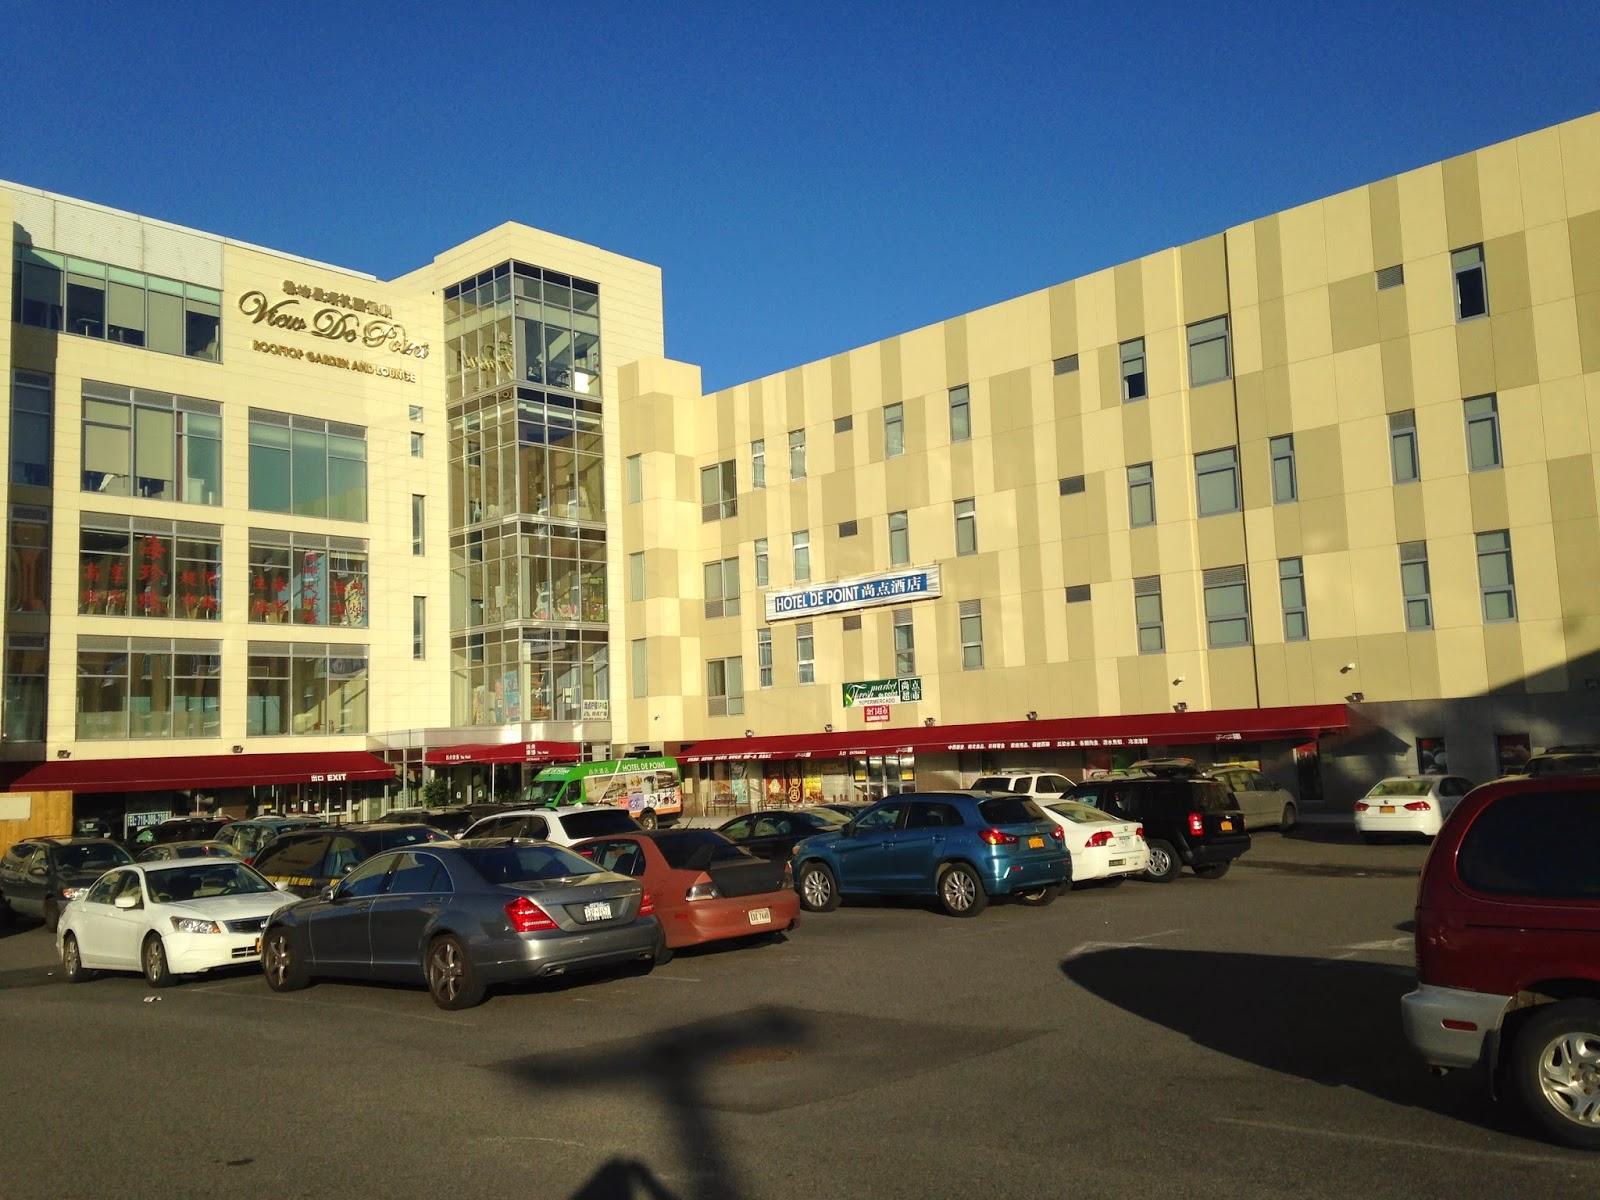 Hotel De Point 20 07 127th St